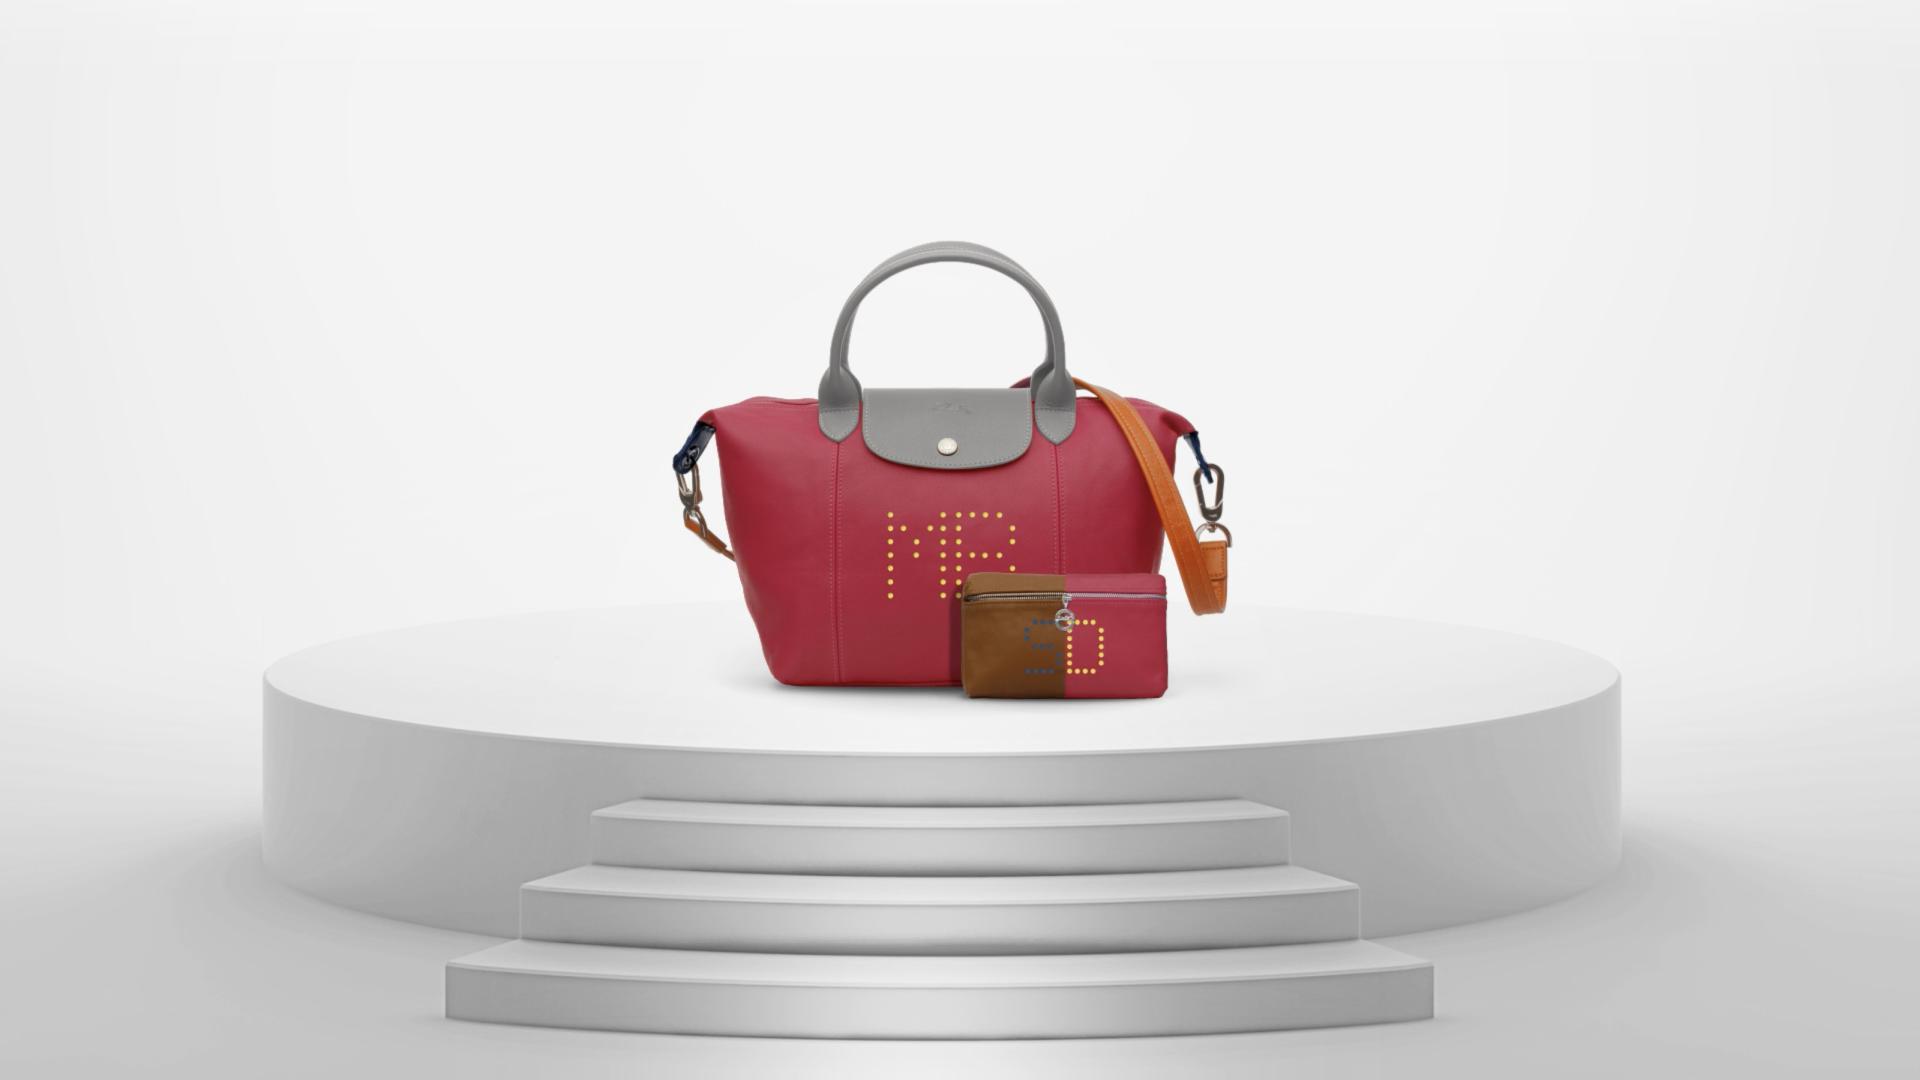 Longchamp image 2